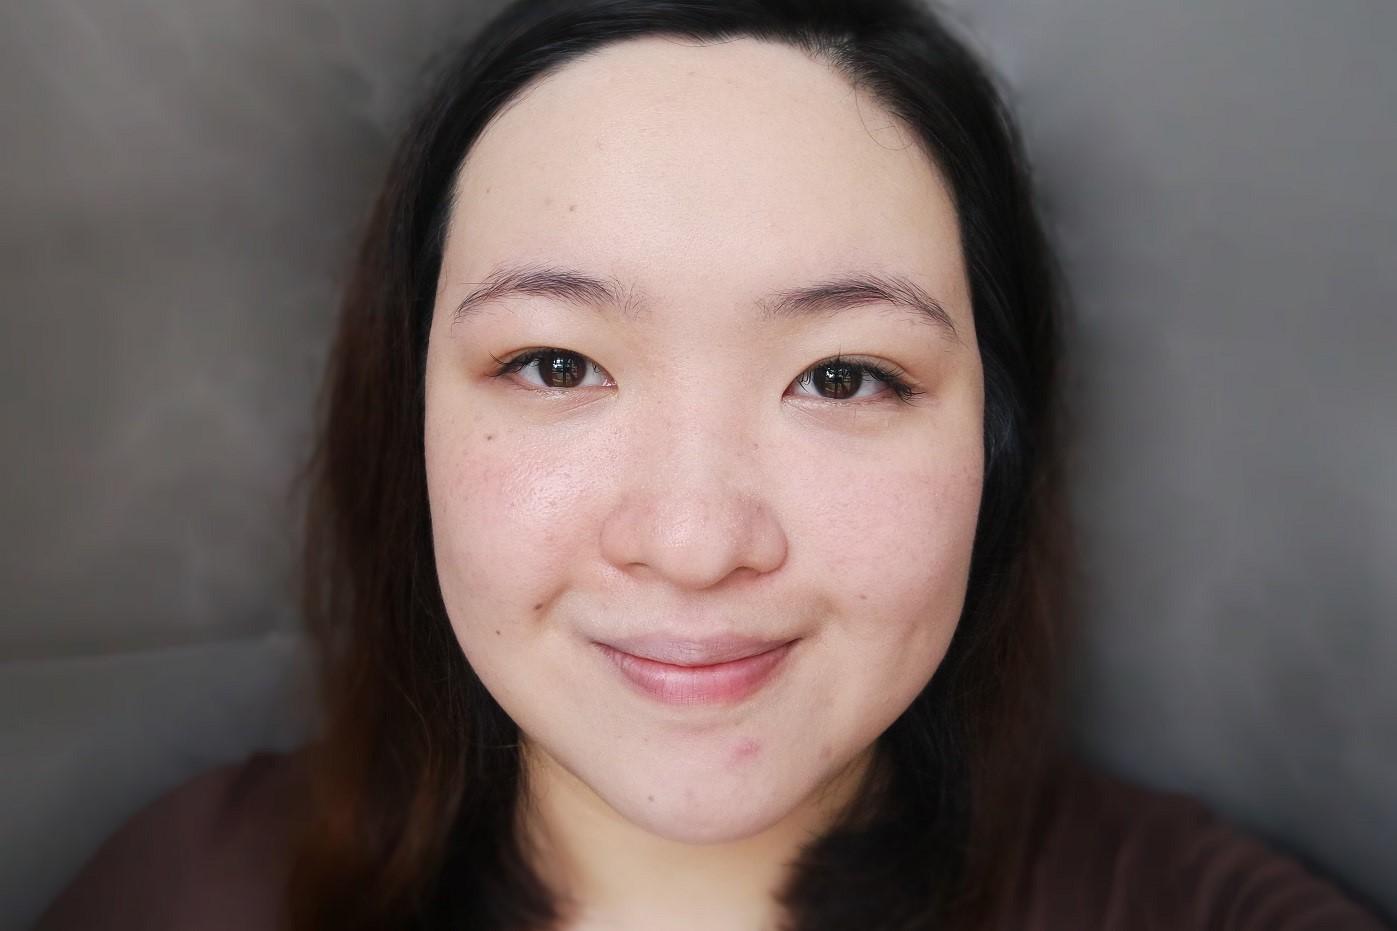 San_San_Face.jpg